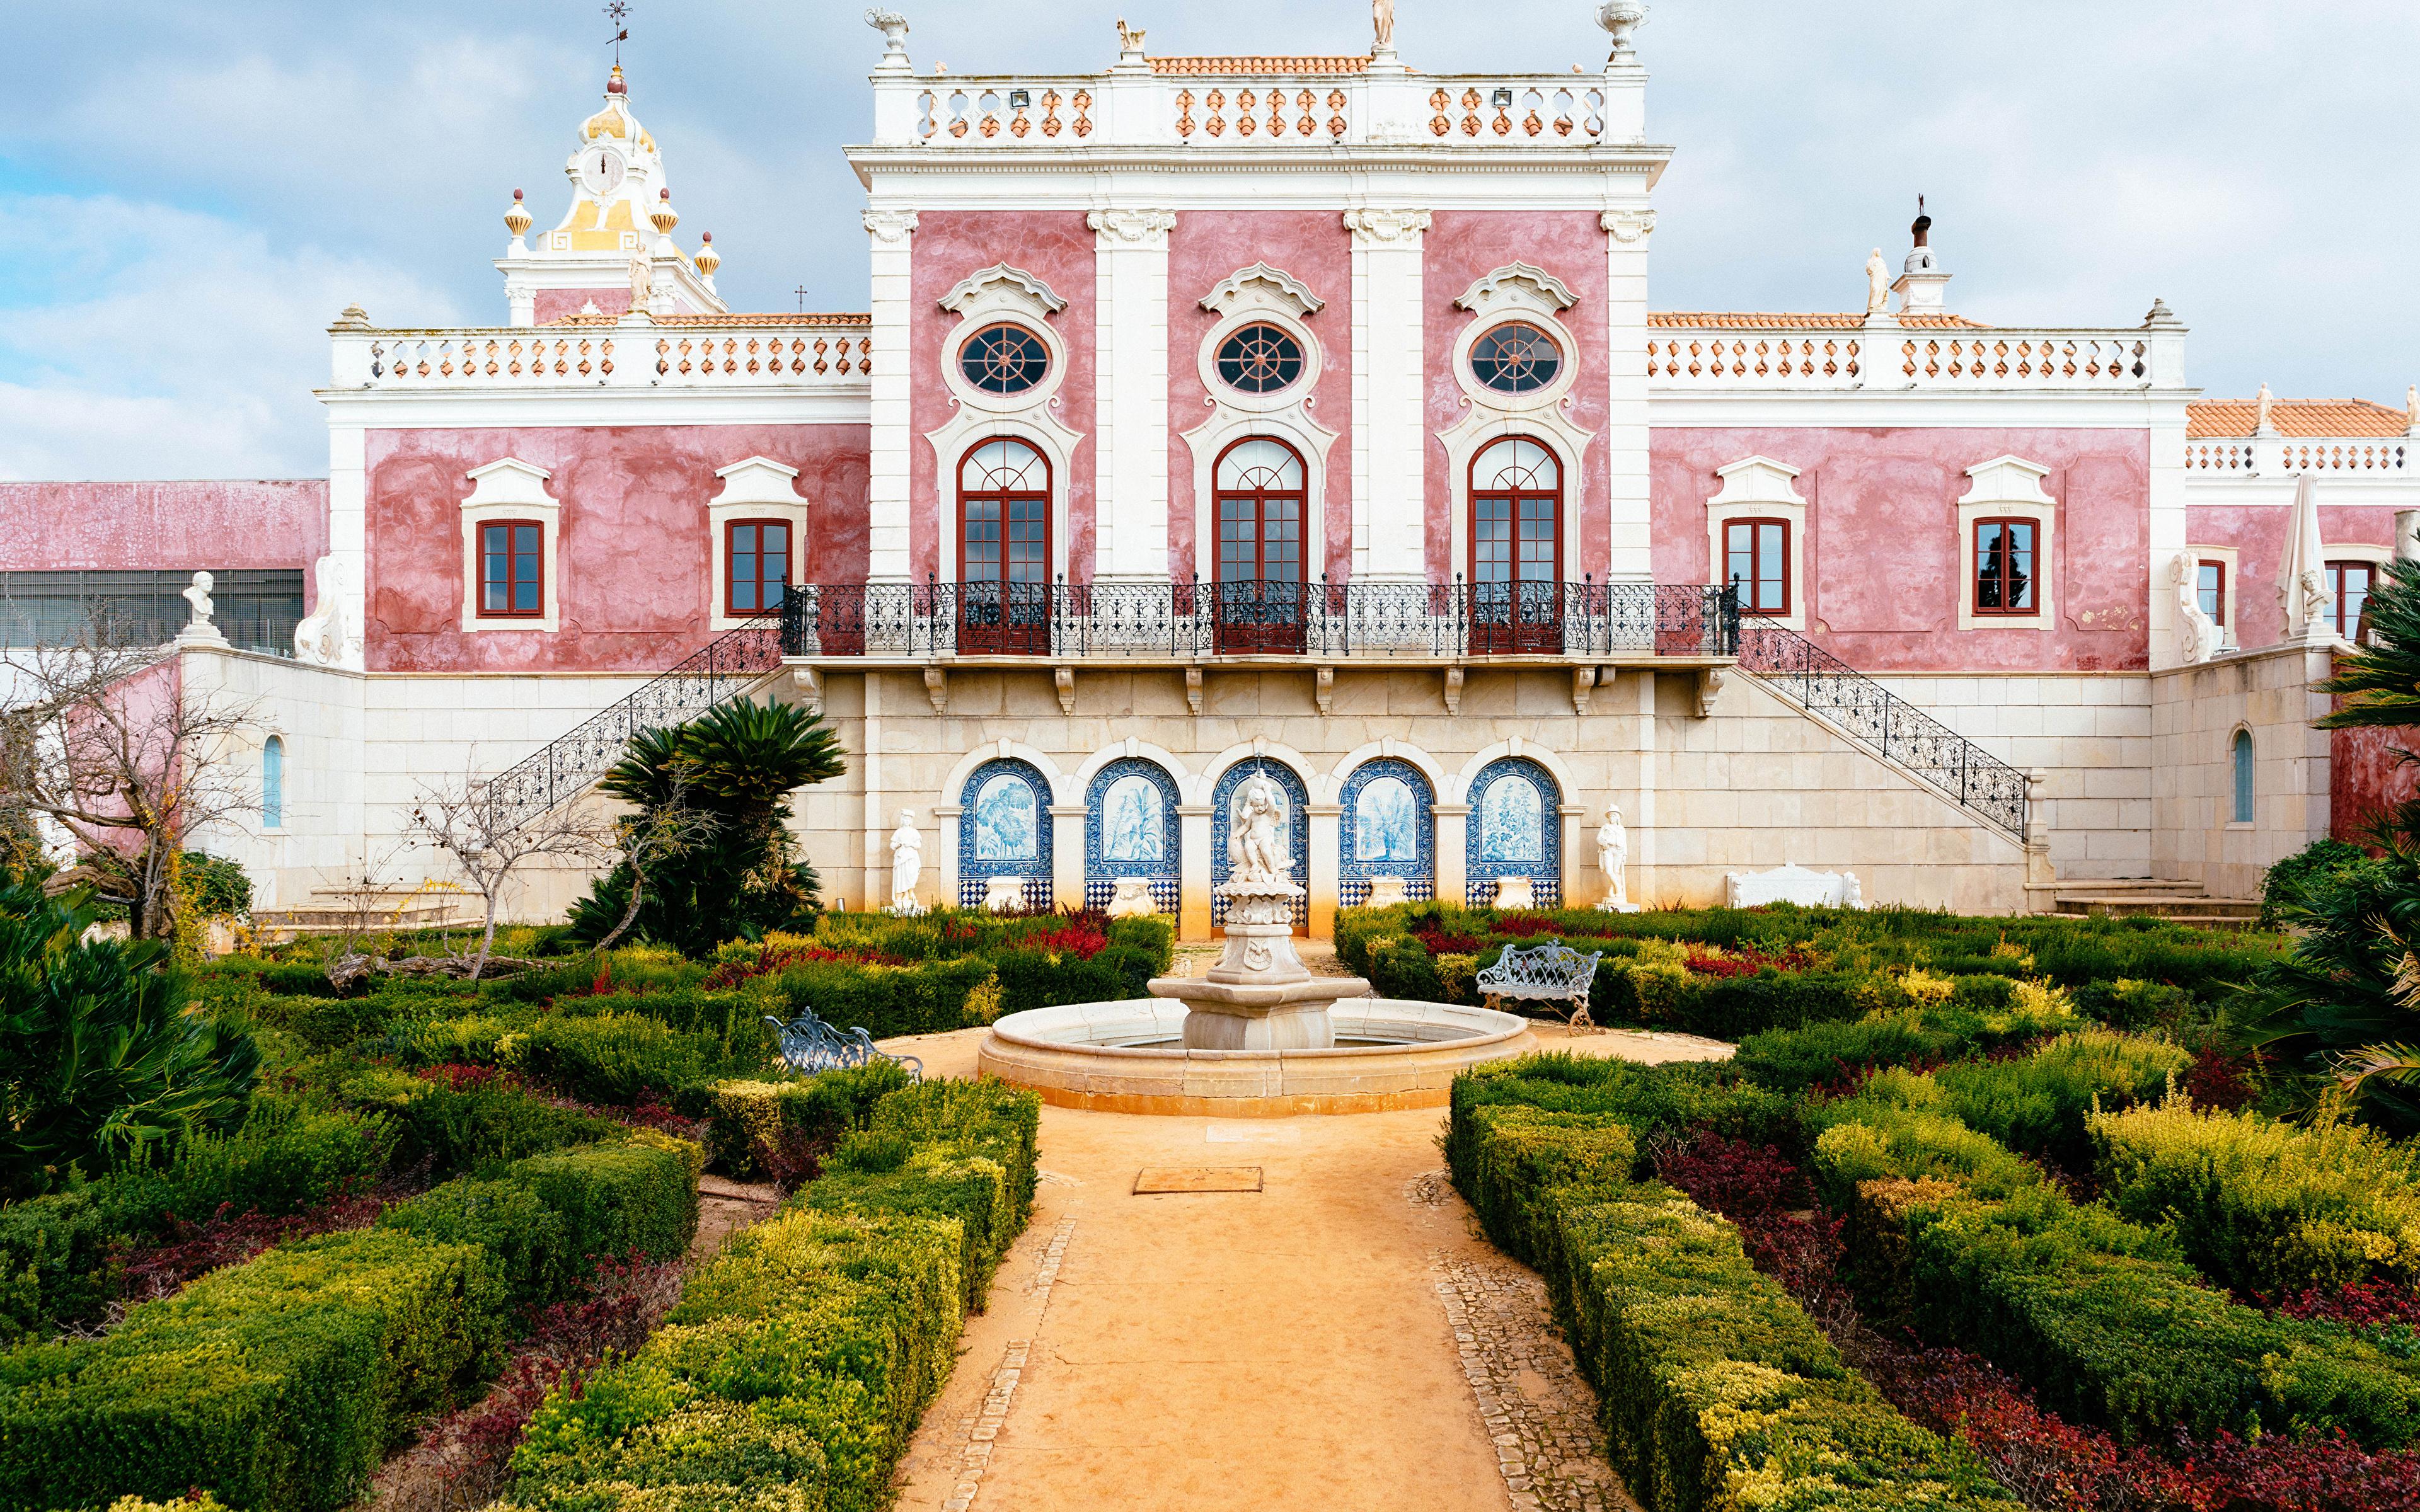 Фотографии дворца Португалия Фонтаны Pousada Palacio De Estoi Faro Сады Кусты город 3840x2400 Дворец кустов Города